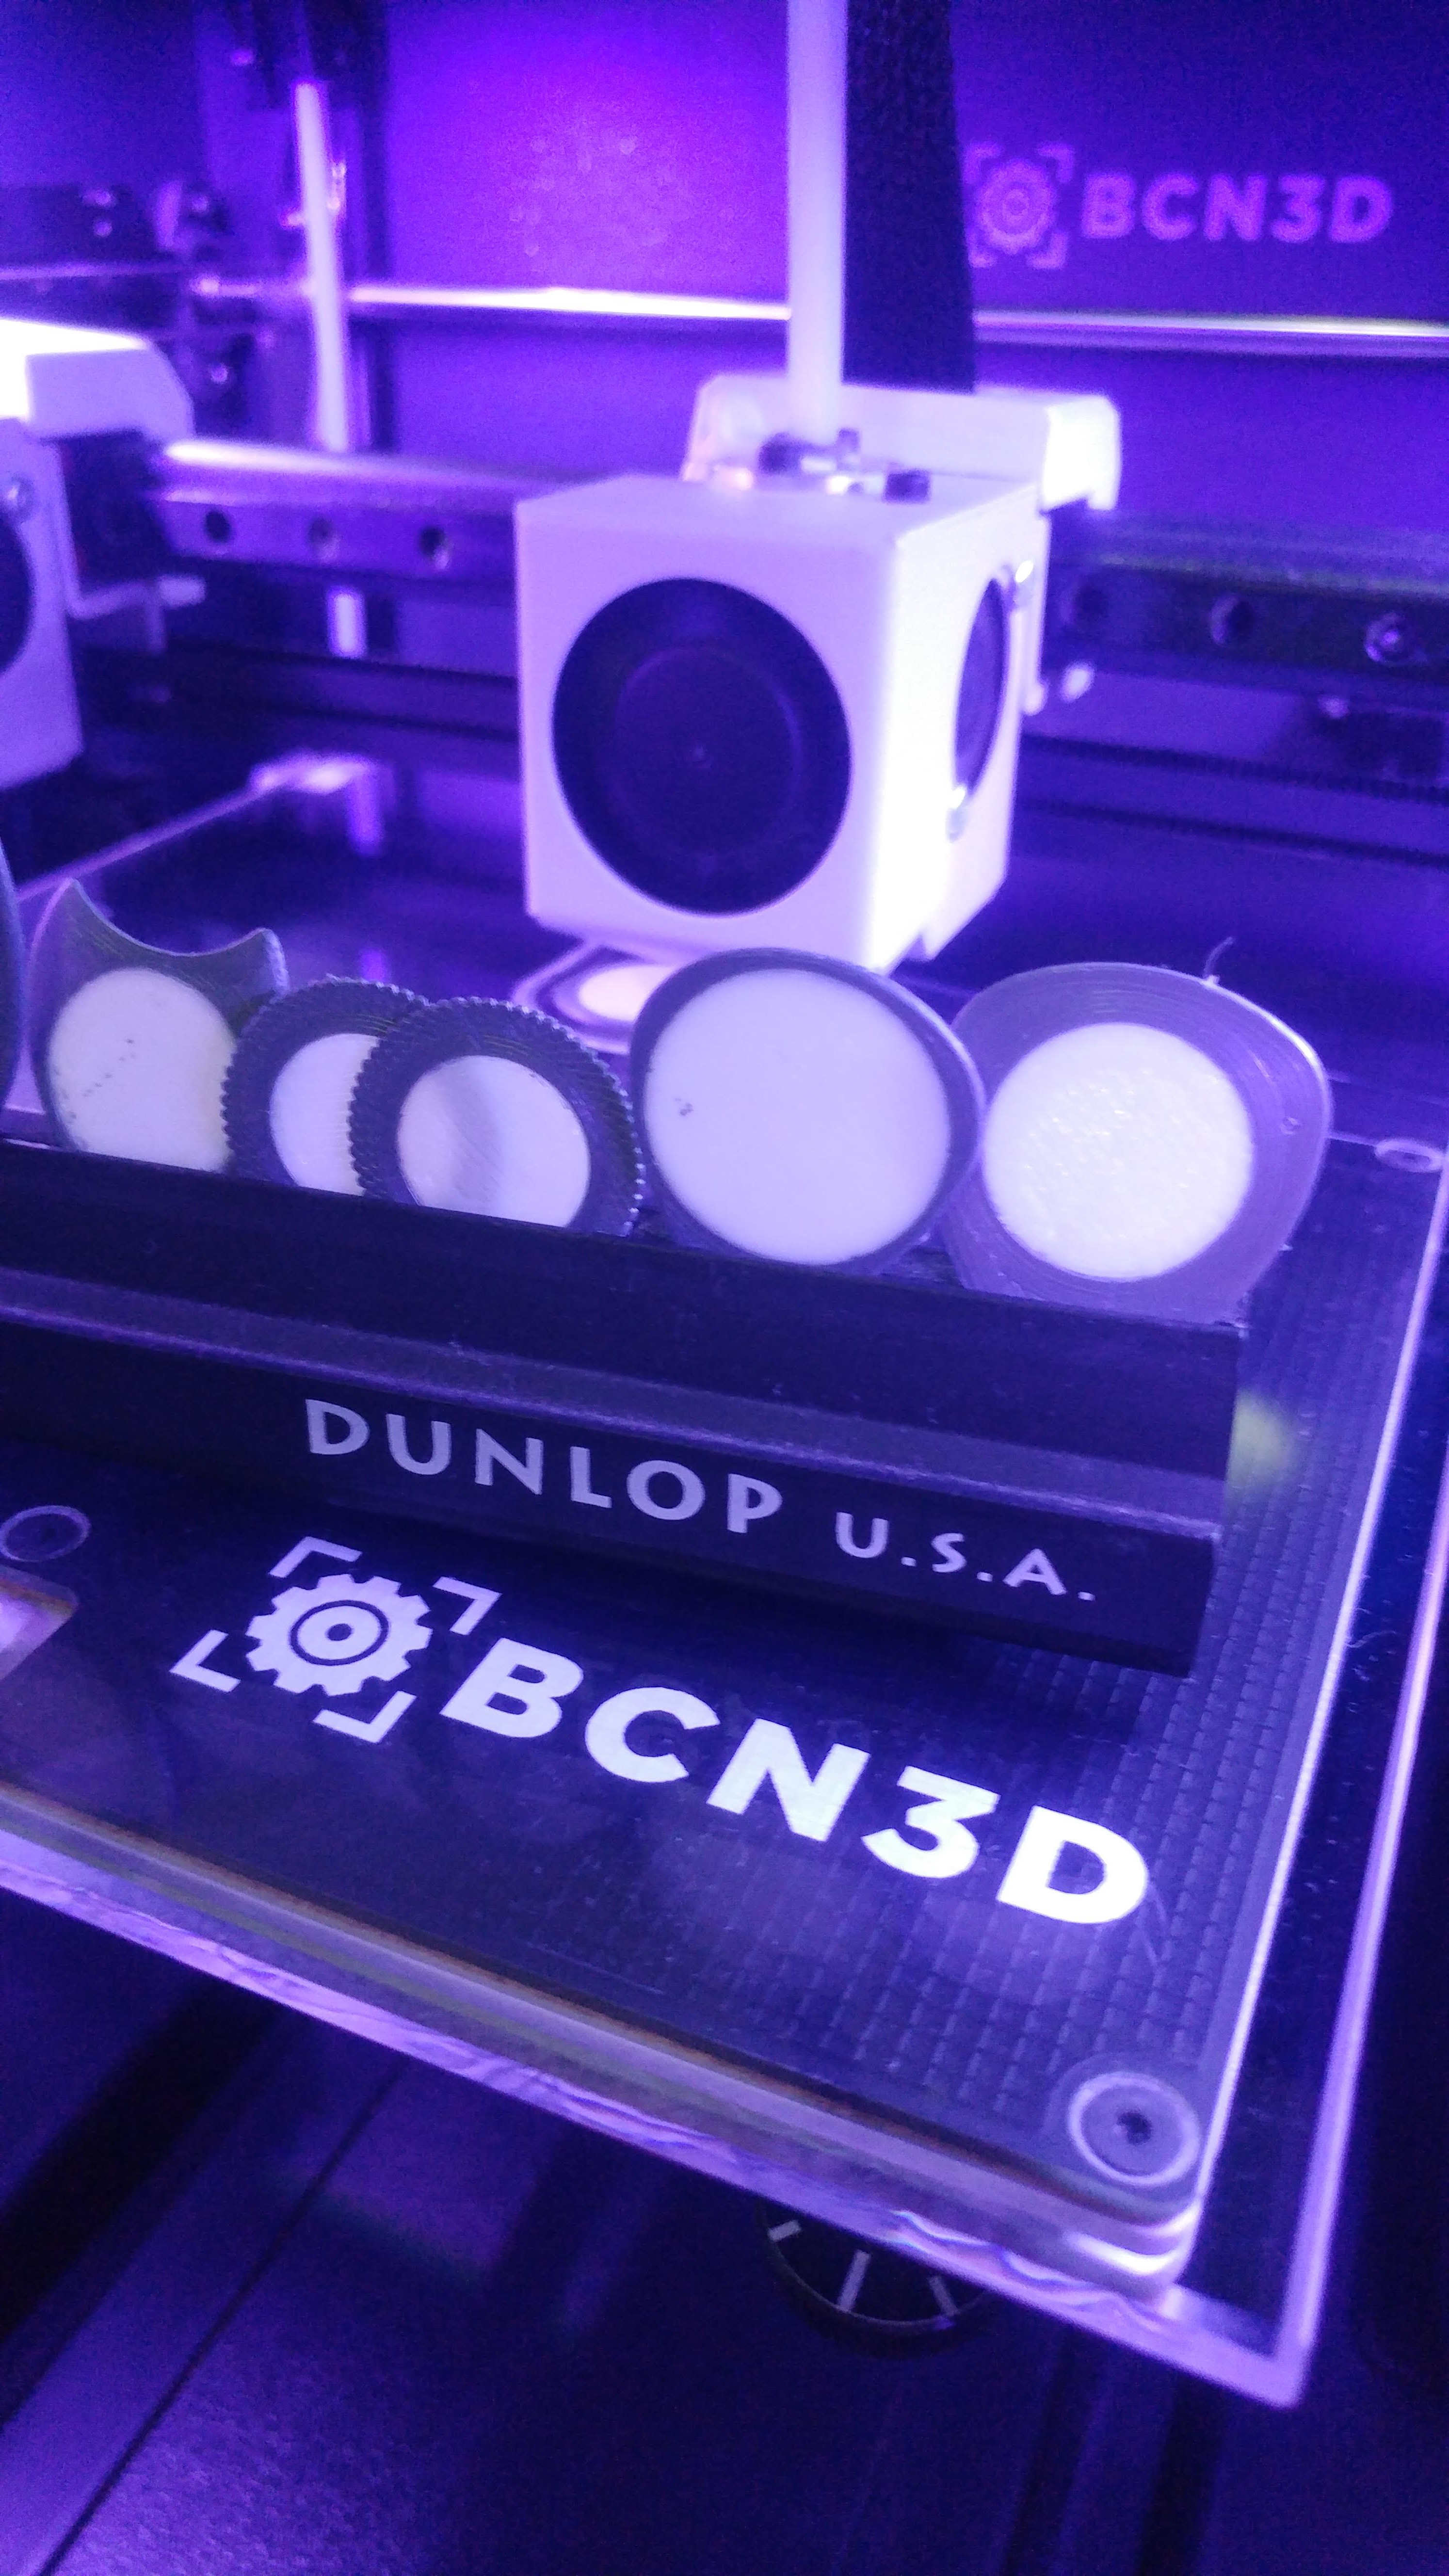 4C68F85B-7A39-4478-8B7A-609FCEBEDB8E.jpeg Download free STL file SIMIR Pua Nido (Nest Pick Guitar) • 3D printable object, carleslluisar